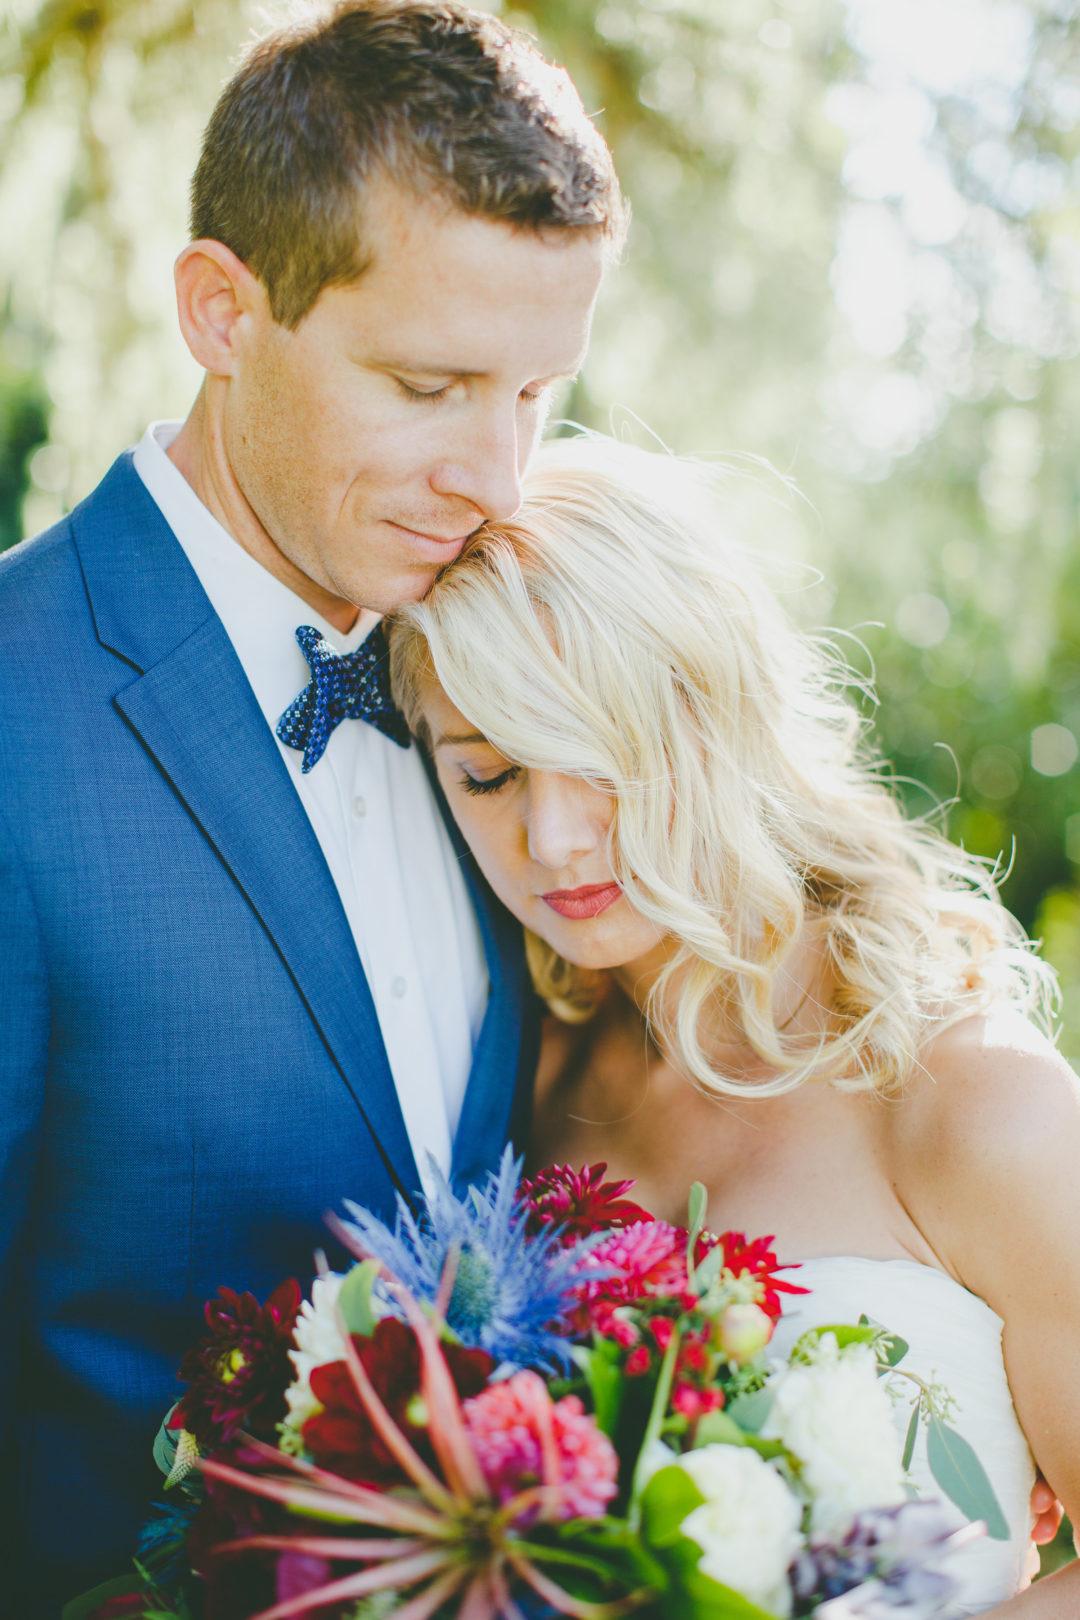 Romantic elopement in Capri